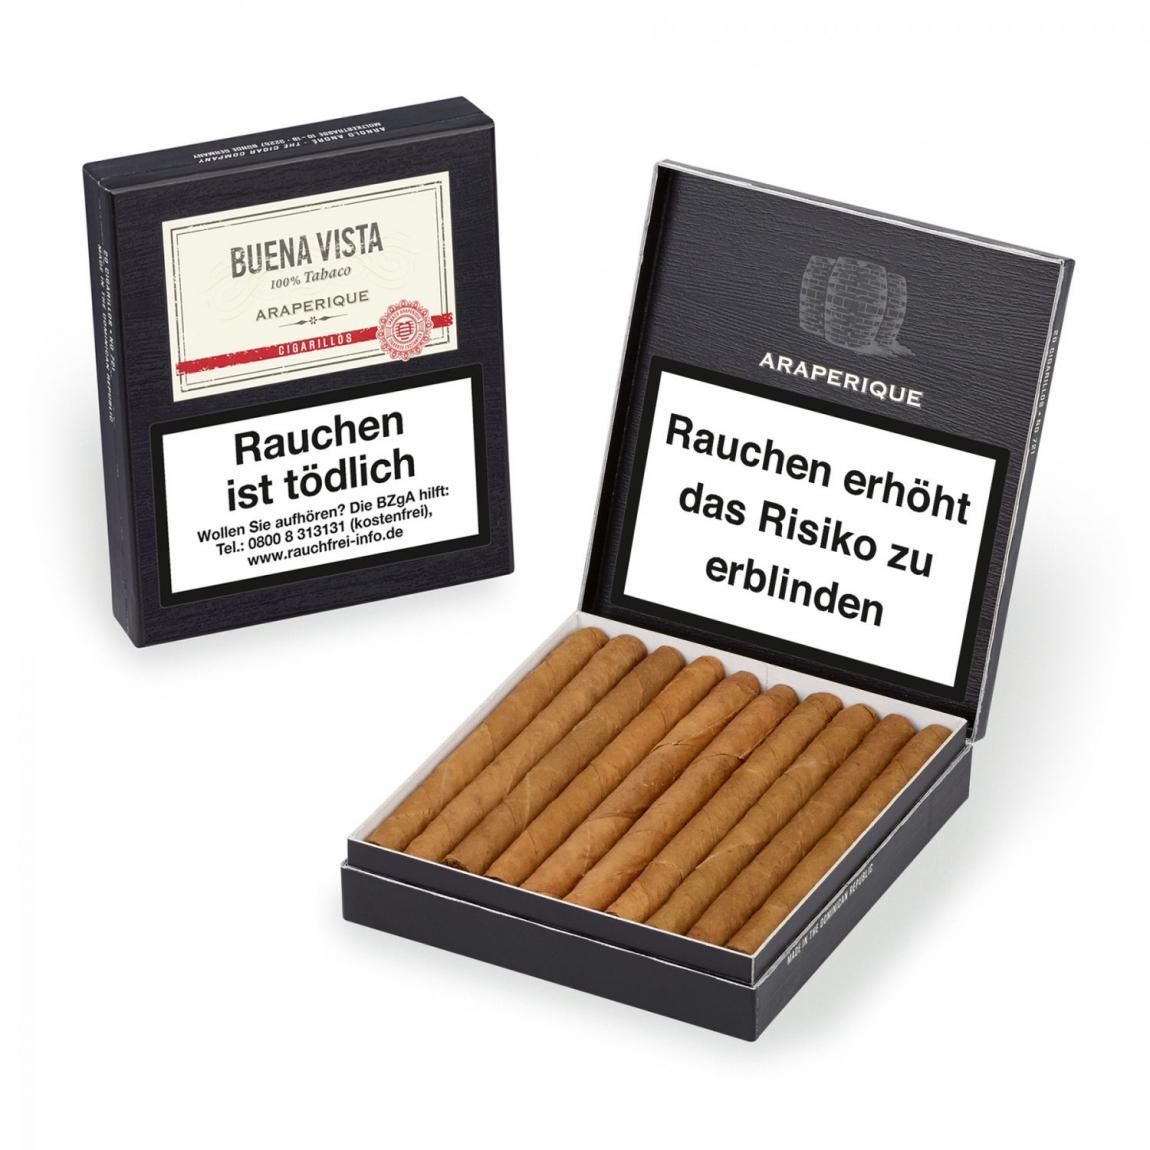 Buena Vista »Araperique« Cigarillos 20er Schachtel